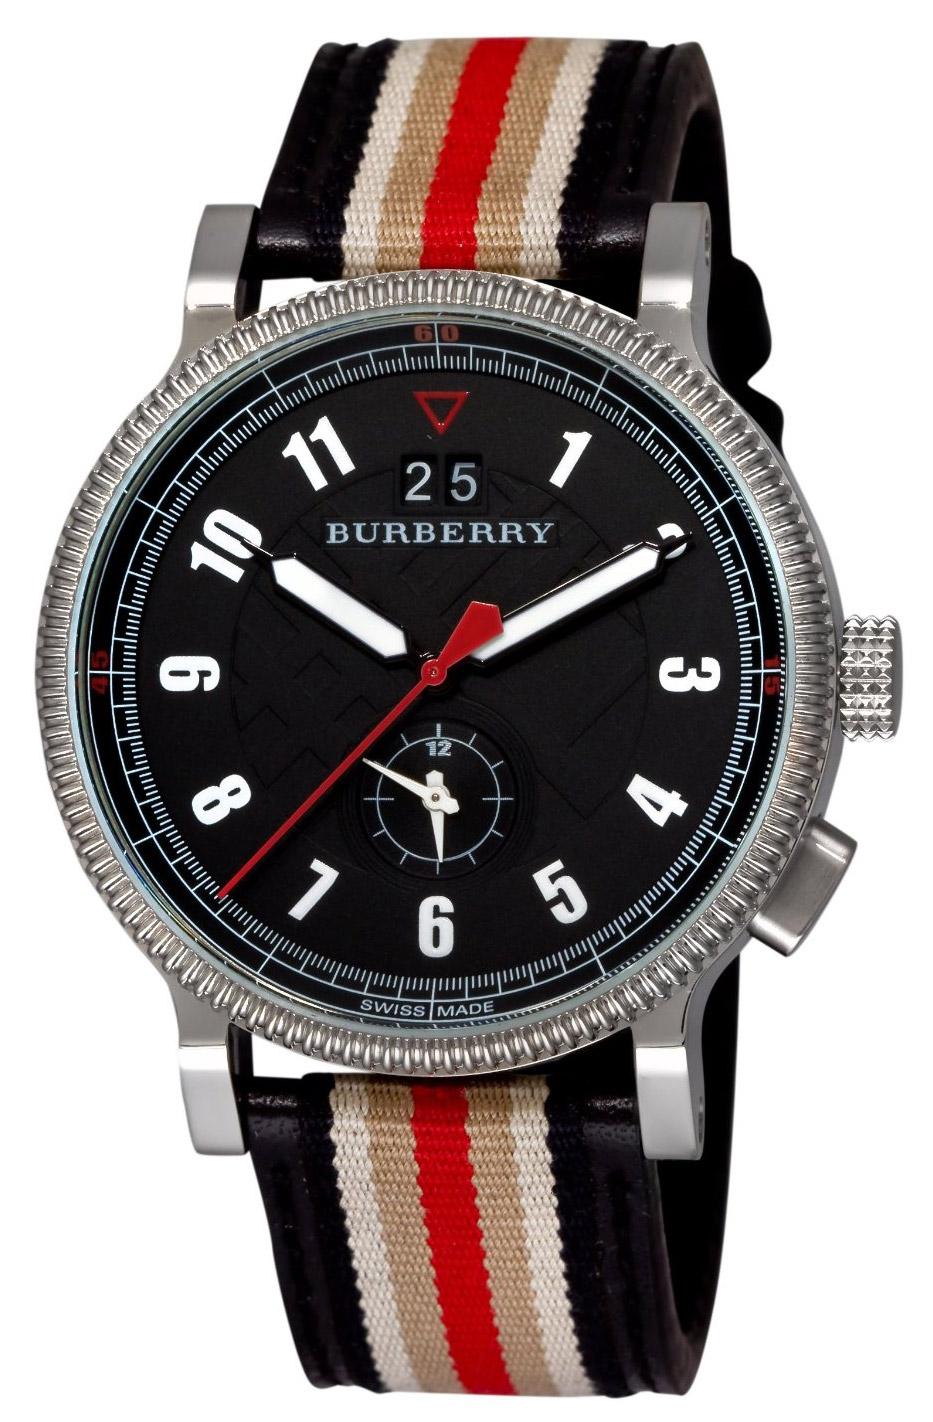 burberry men s watches at gemnation com burberry tricolor webbing dual time men s watch model bu7680